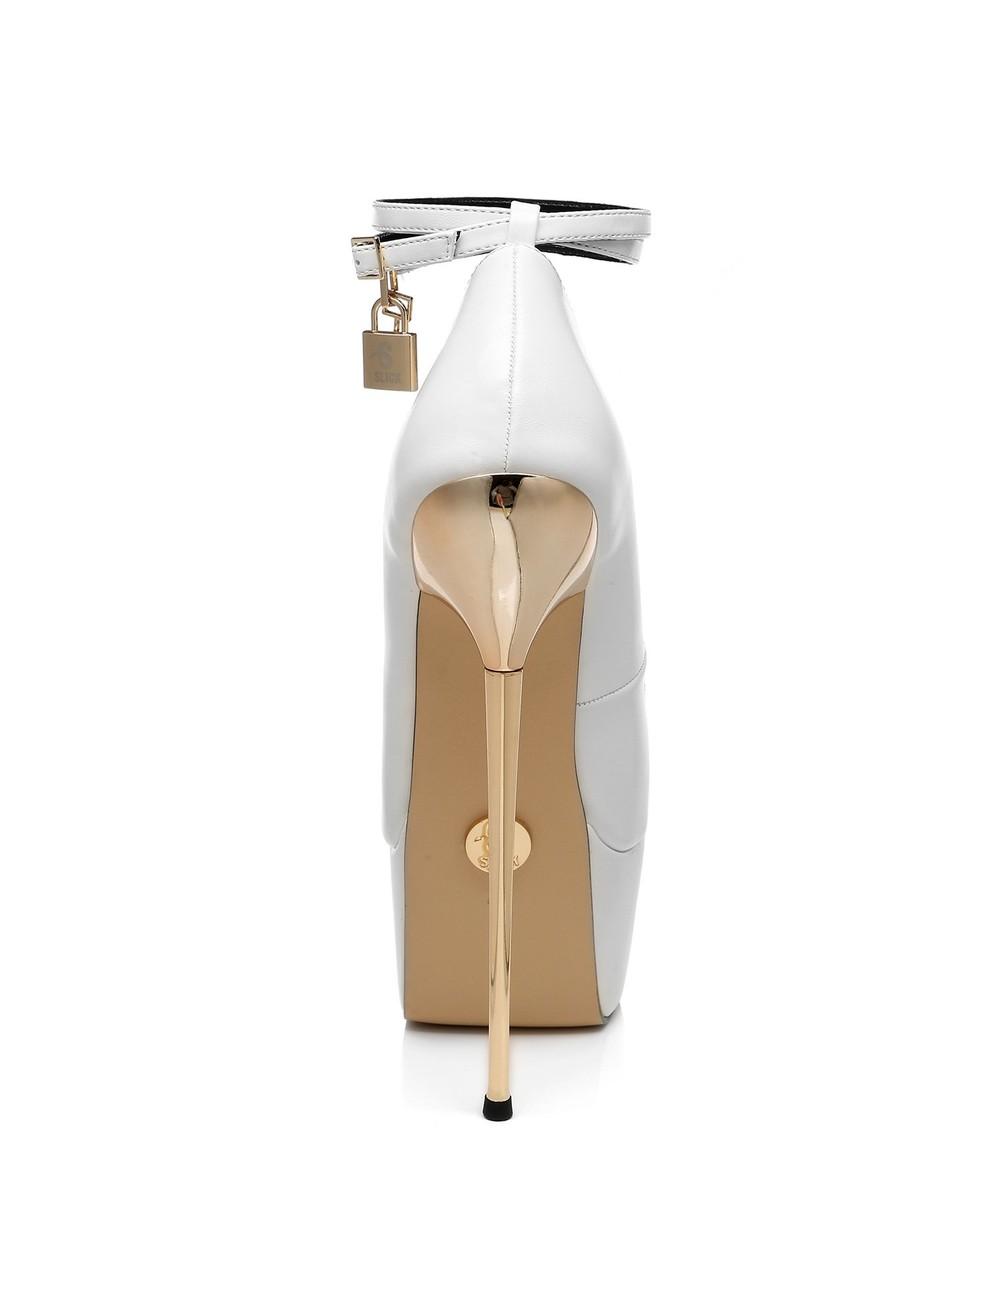 SLICK White matte ESSENCE Giaro SLICK platform pumps with locking ankle strap